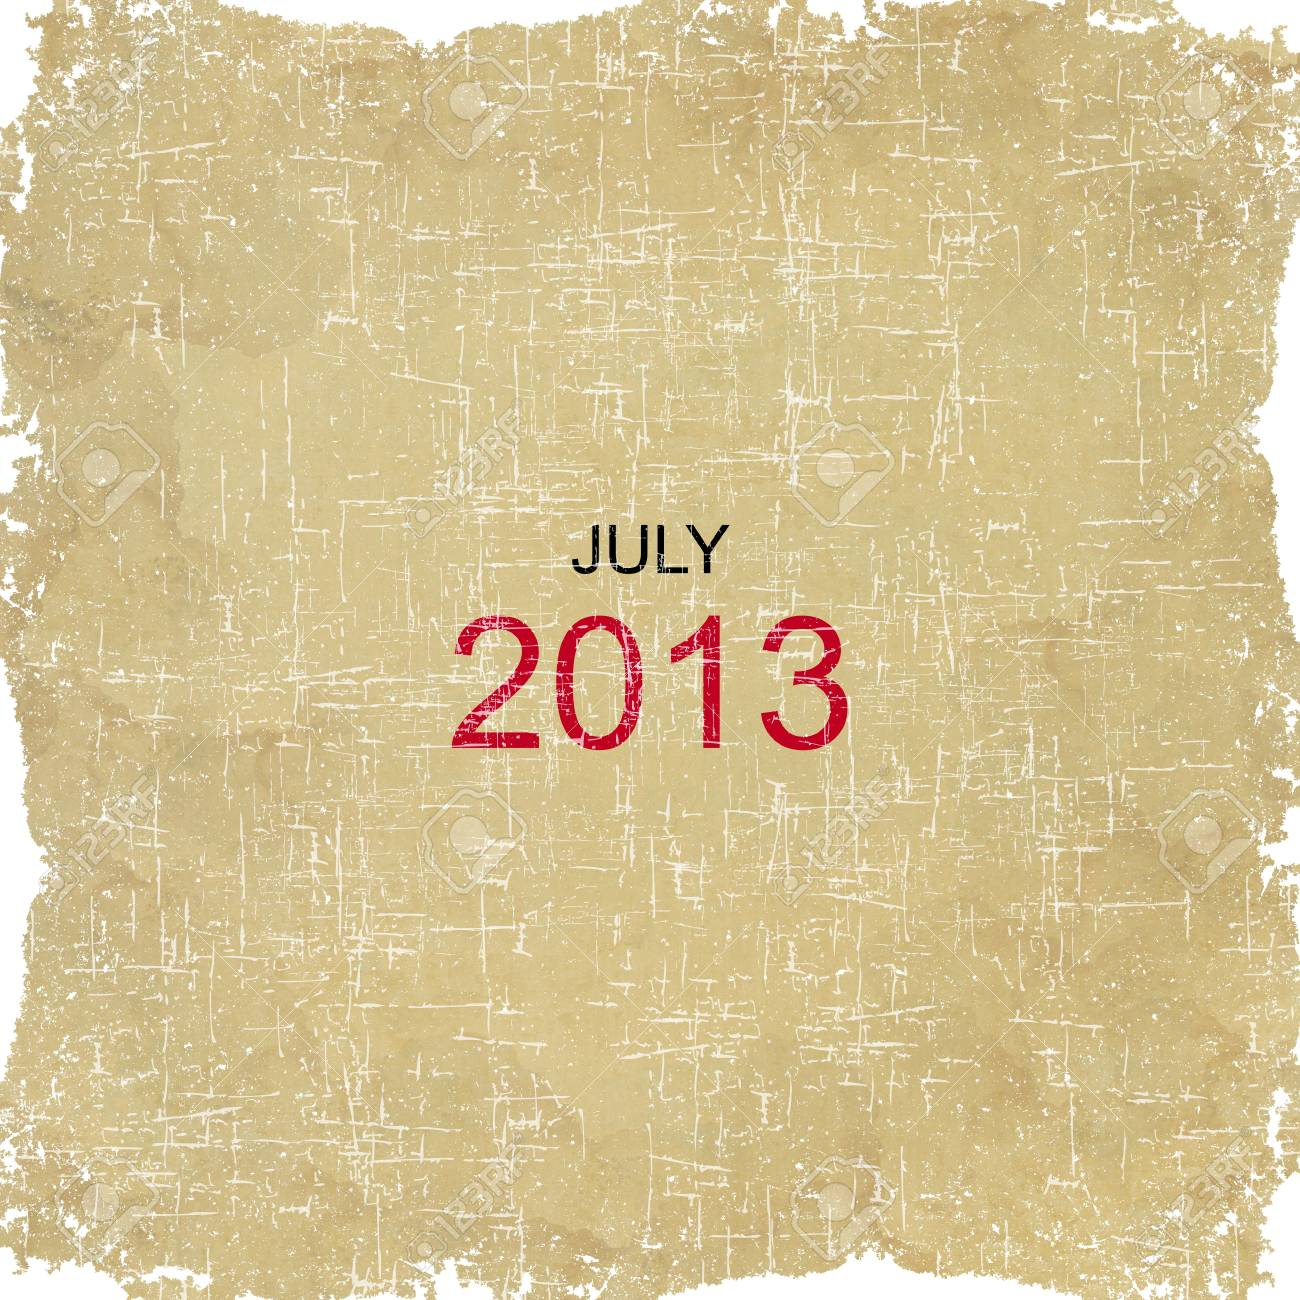 2013 Calendar Old Paper Design - July Stock Photo - 16766401